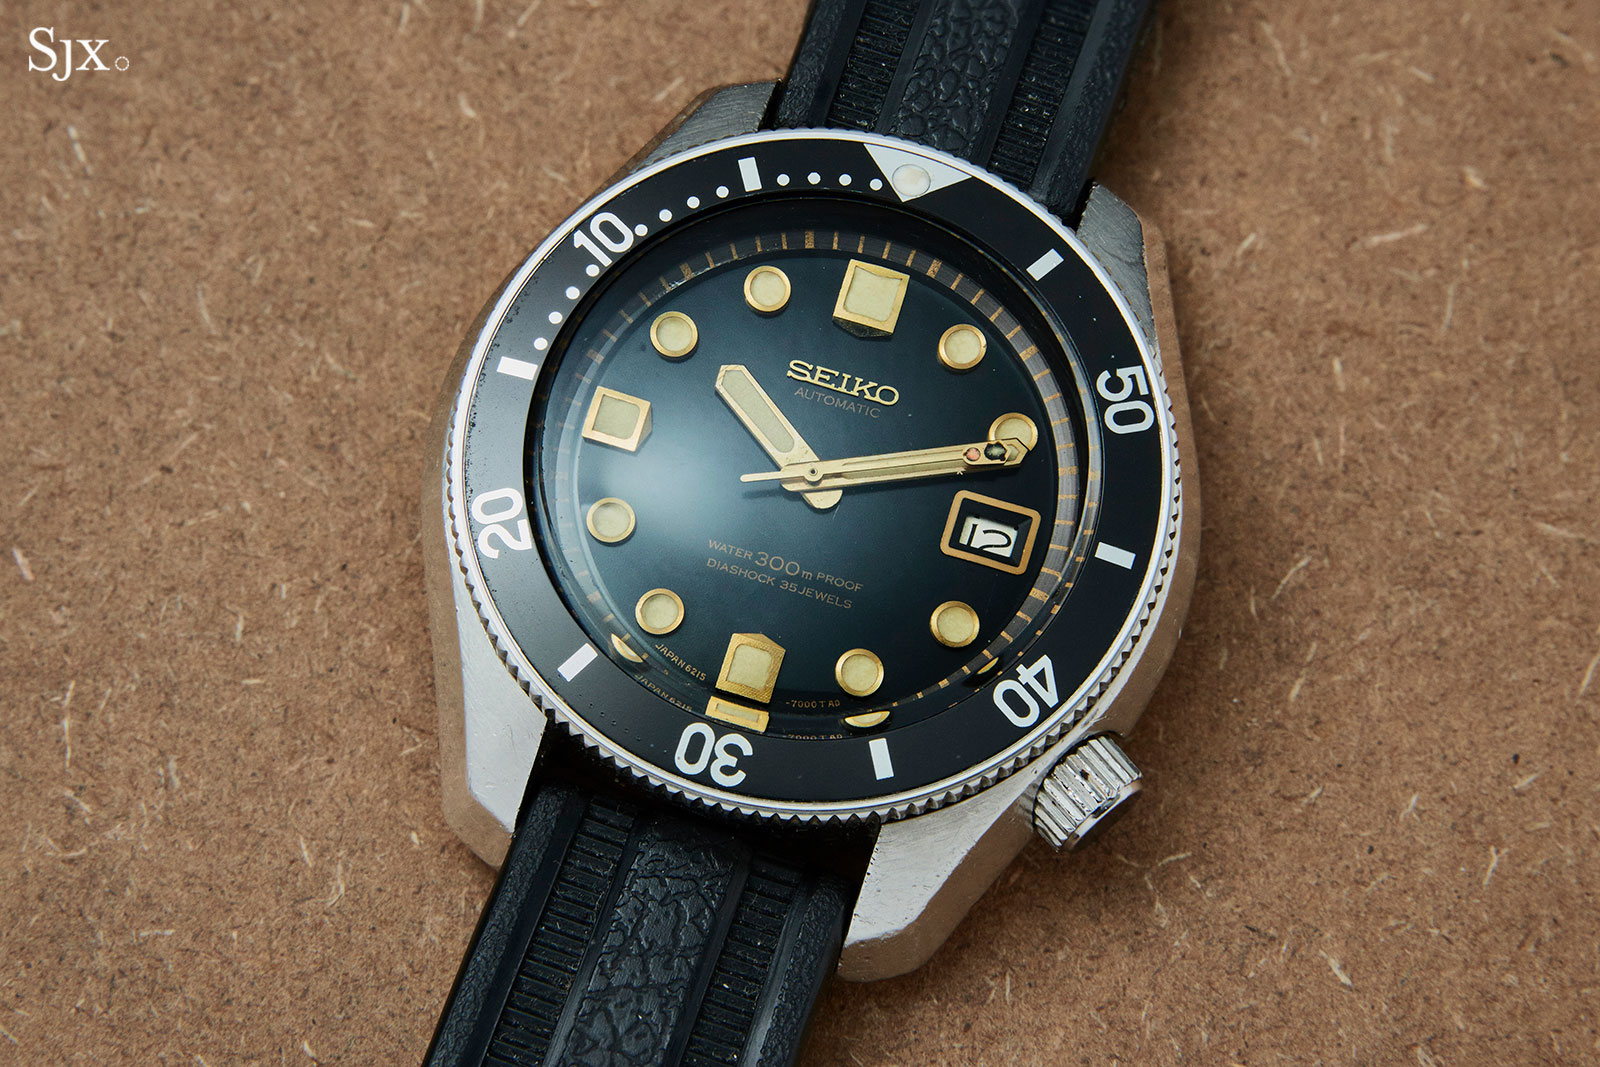 Seiko 300m diver 6215-7000 2